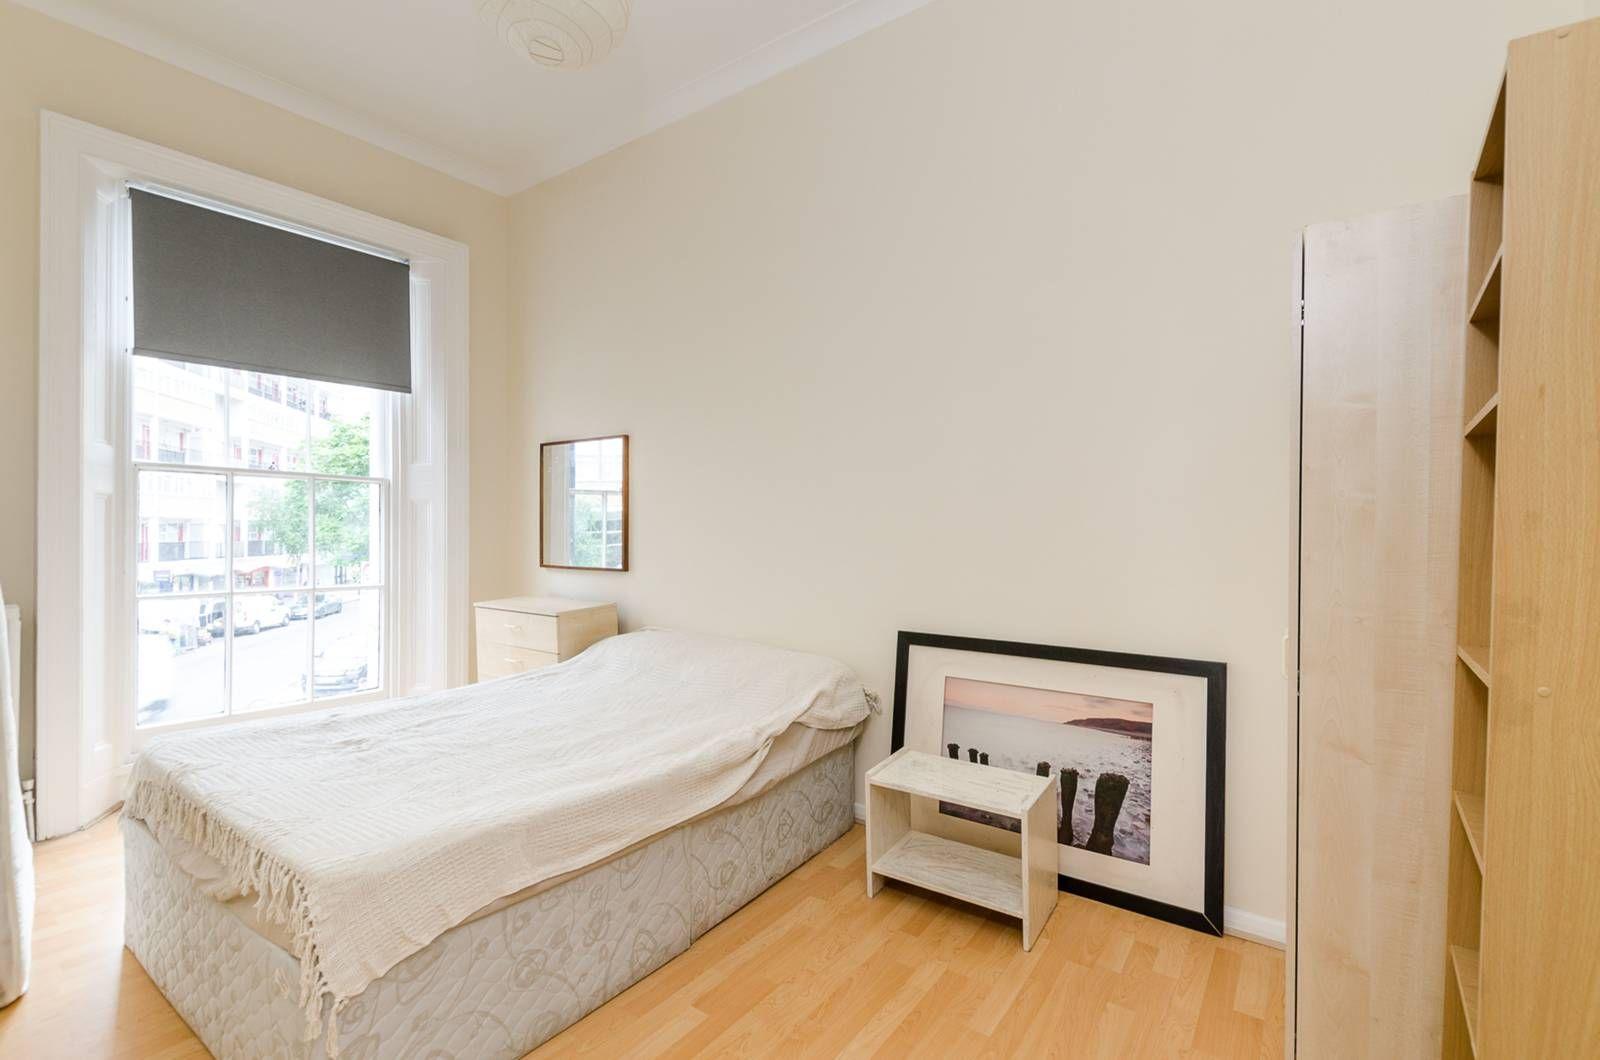 https://www.realestatexchange.co.uk/properties/compra-casa-a-londra-lupus-street-pimlico-londra-sw1v/?lang=it